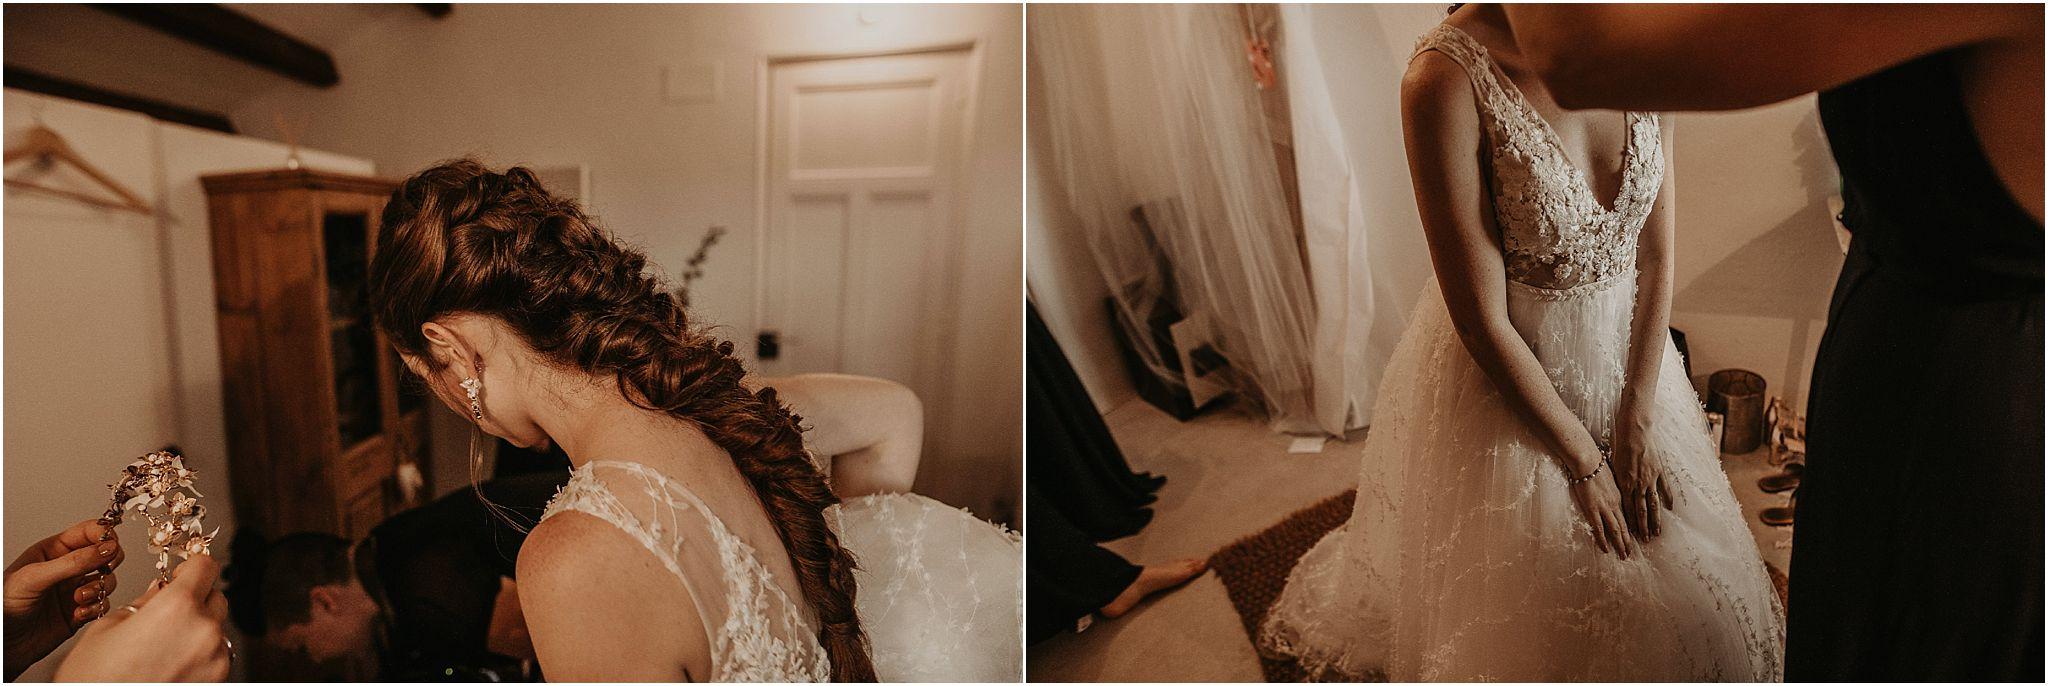 Romantic wedding in Barcelona 26.jpg